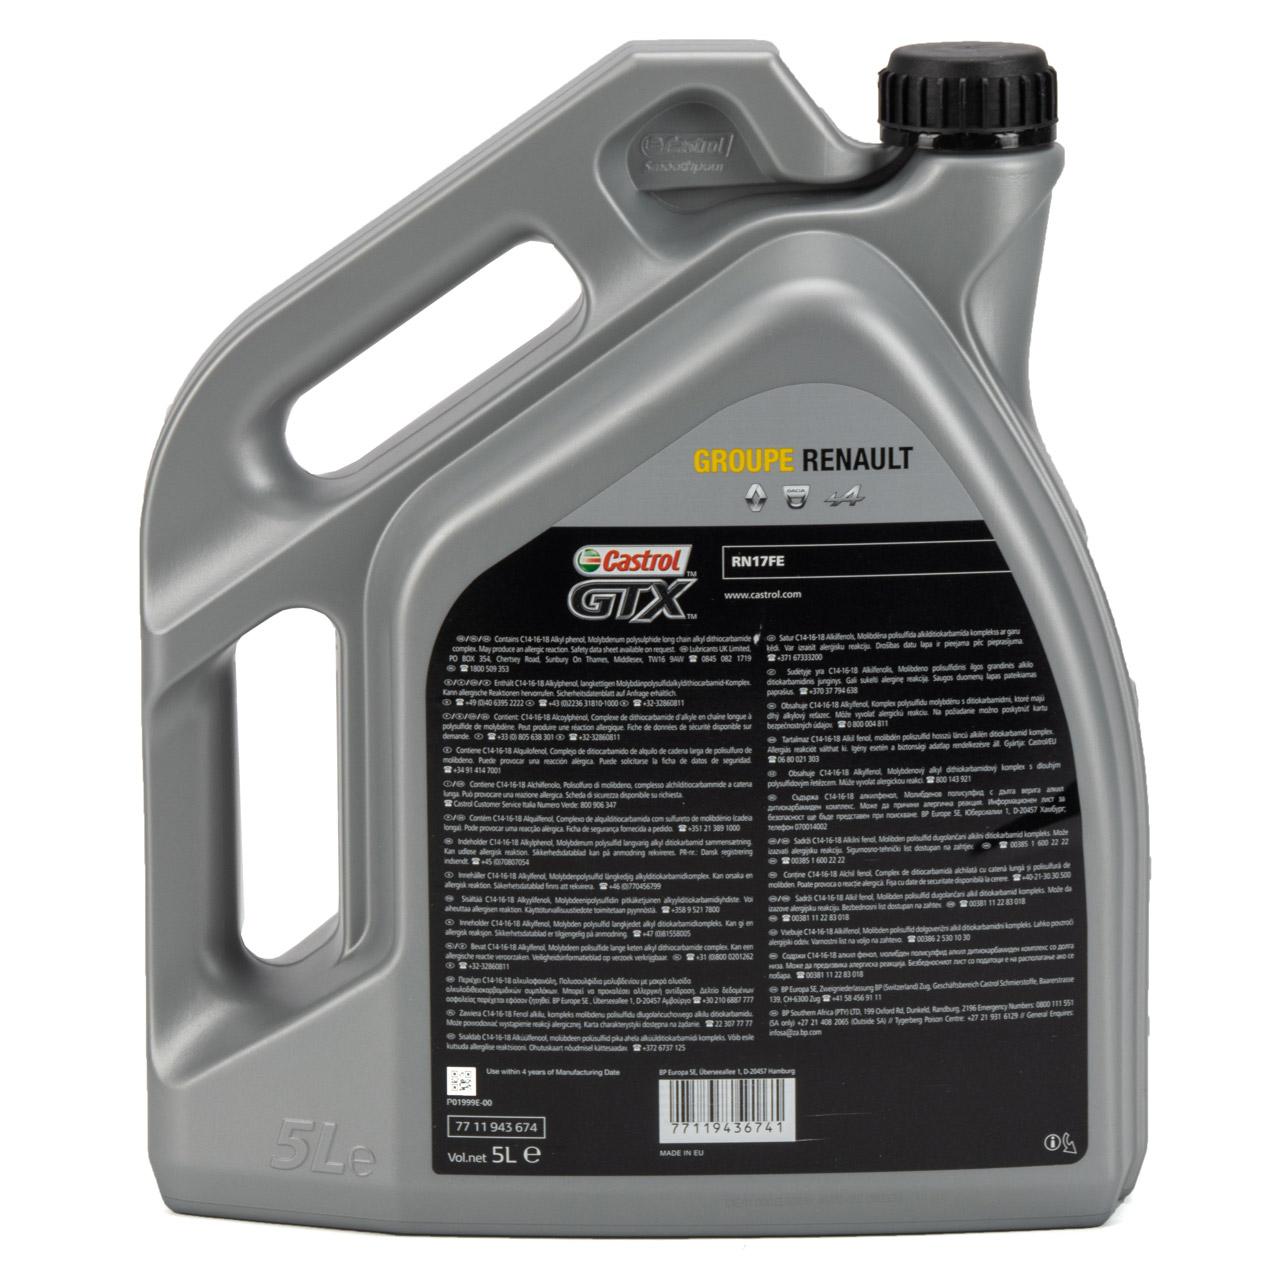 CASTROL Motoröl Öl GTX RN-SPEC 0W-20 0W20 für Renault RN17FE - 5L 5 Liter